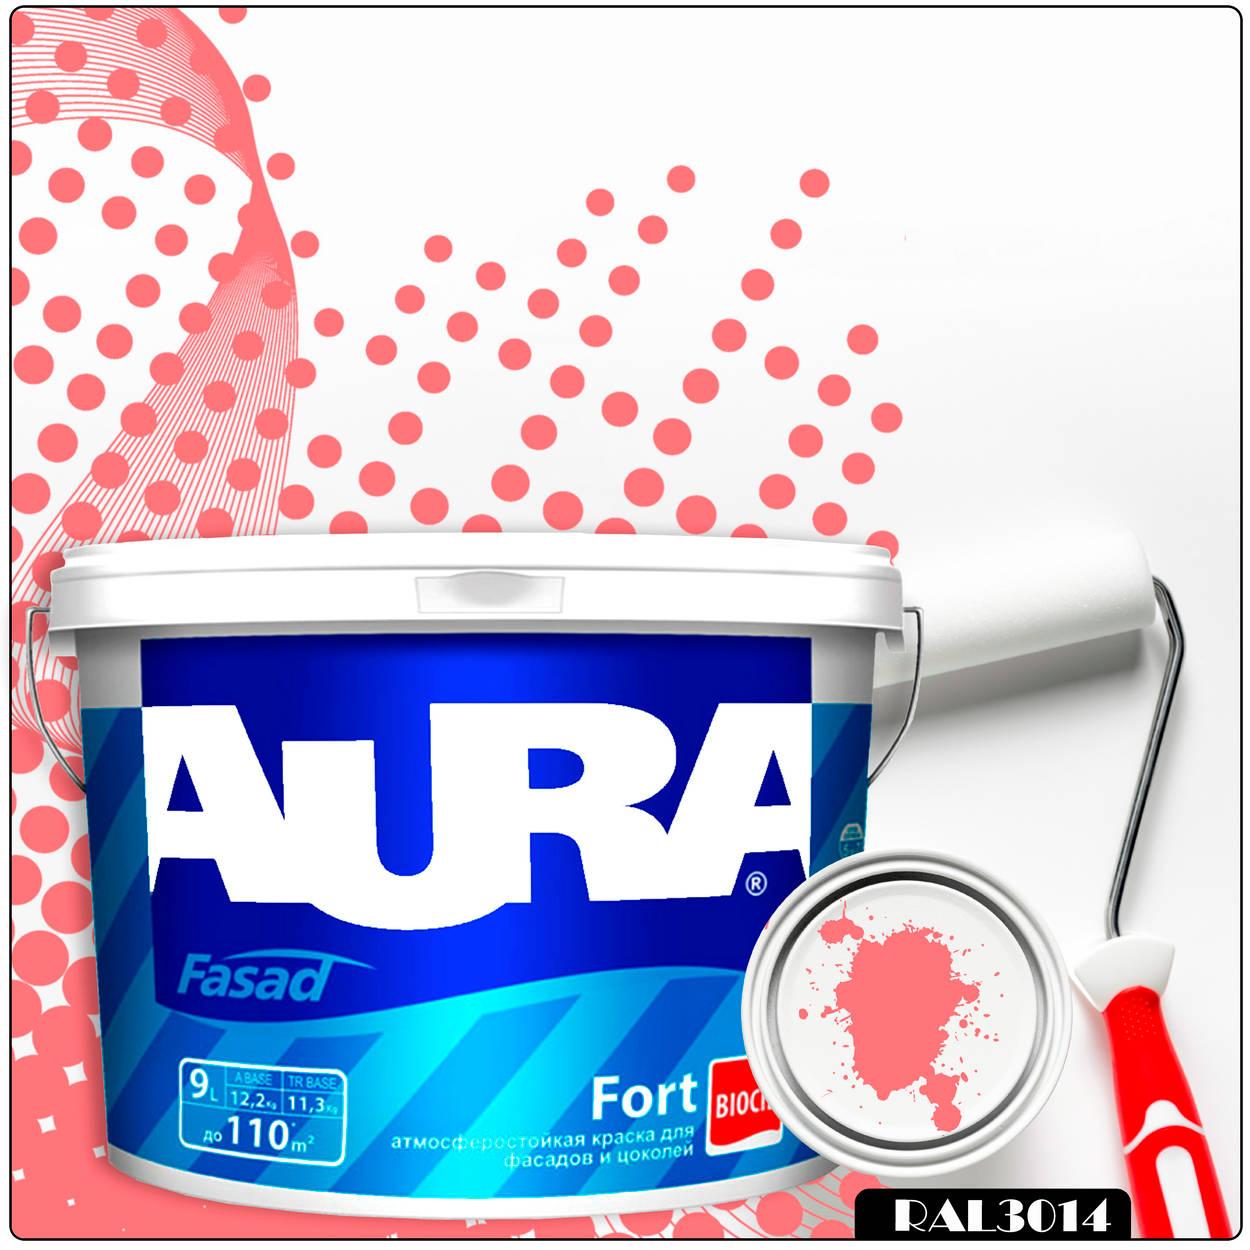 Фото 12 - Краска Aura Fasad Fort, RAL 3014 Антик розовый, латексная, матовая, для фасада и цоколей, 9л, Аура.